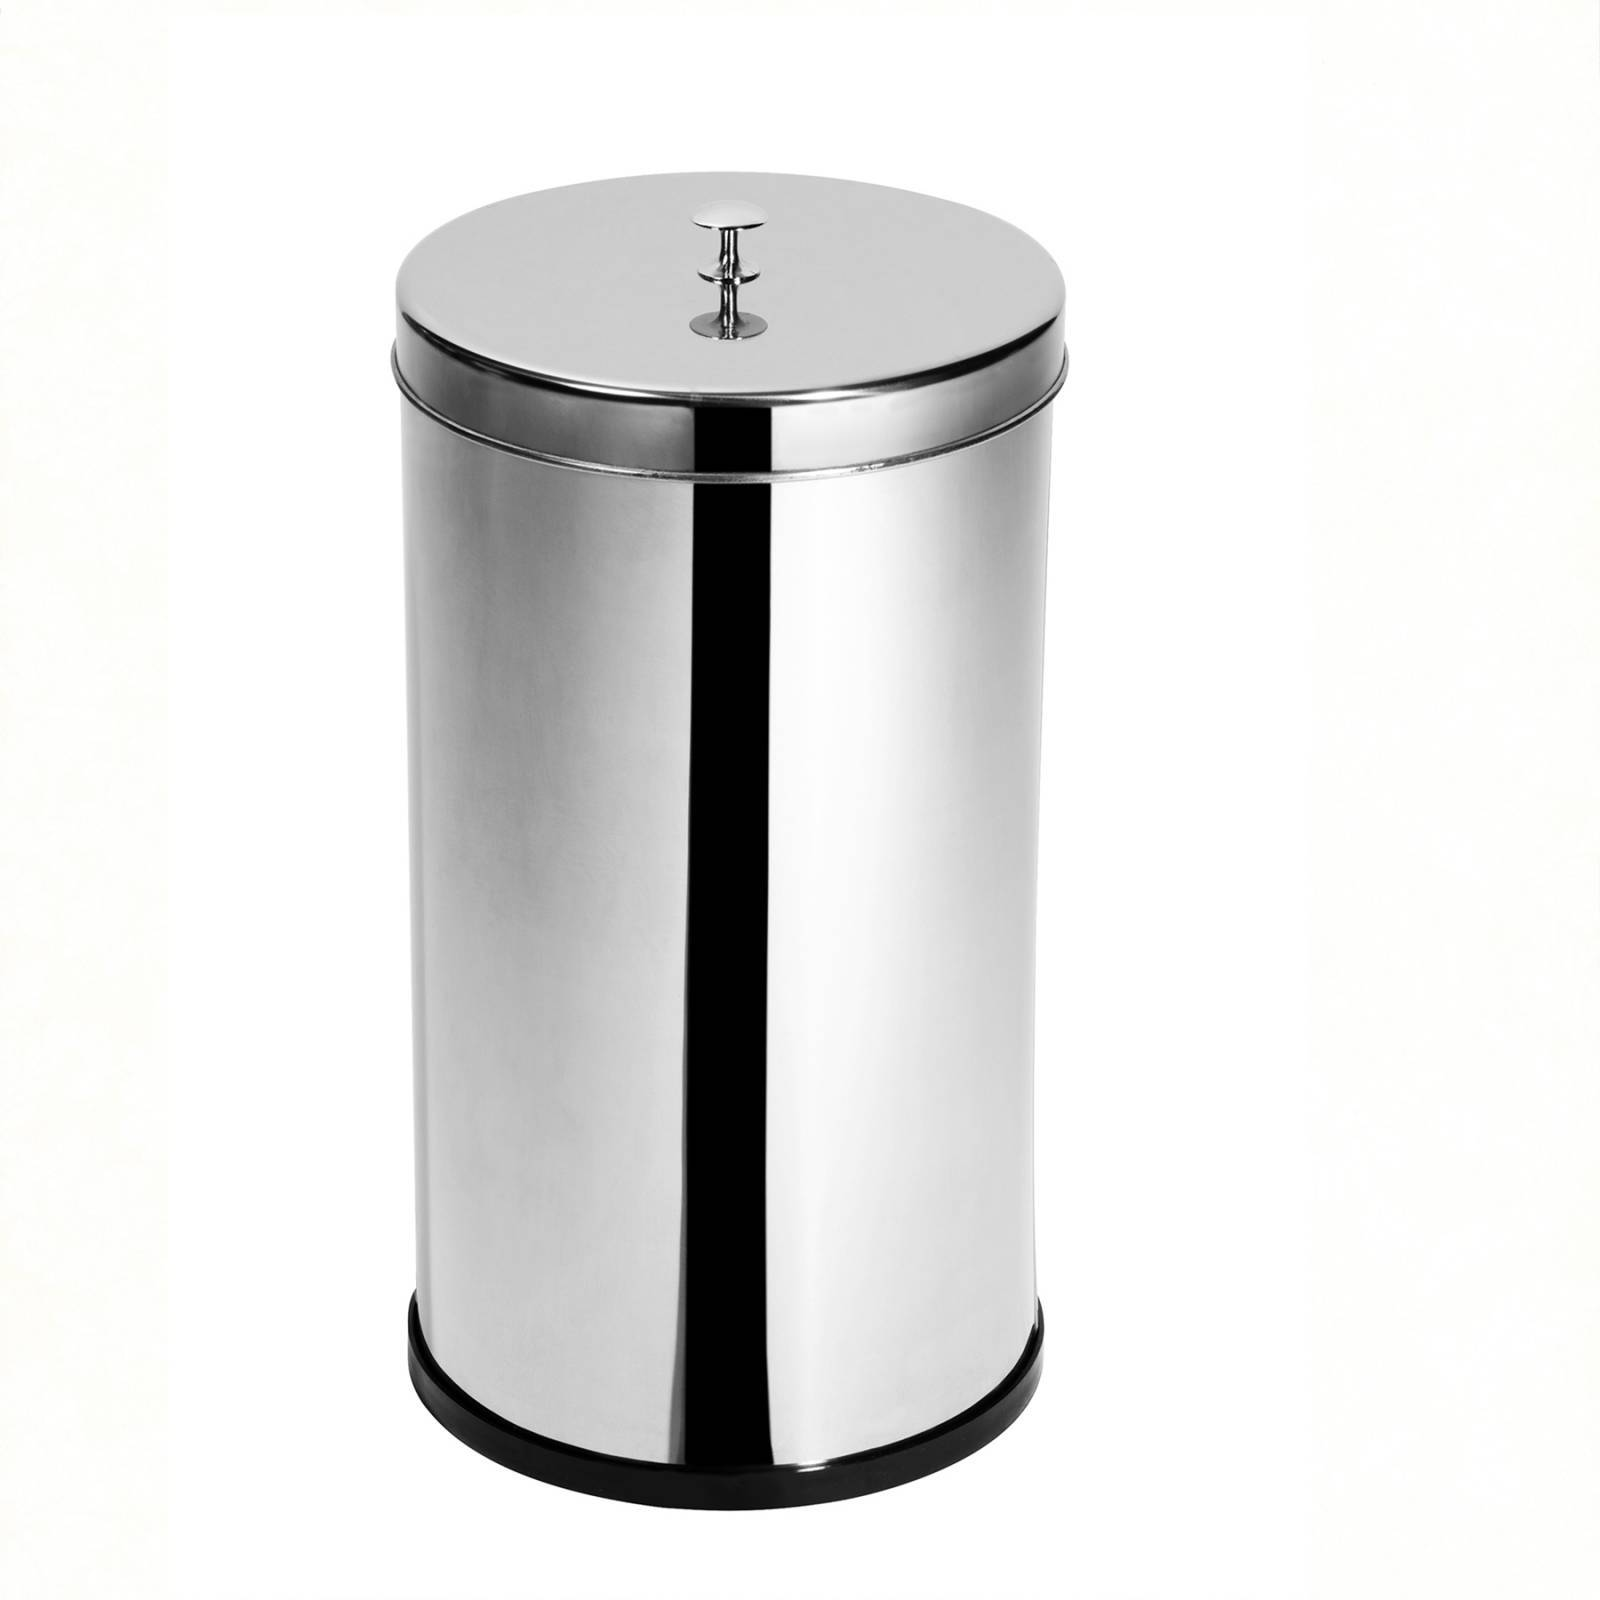 Lixeira Inox c/ tampa e puxador 10 Litros - Elegance